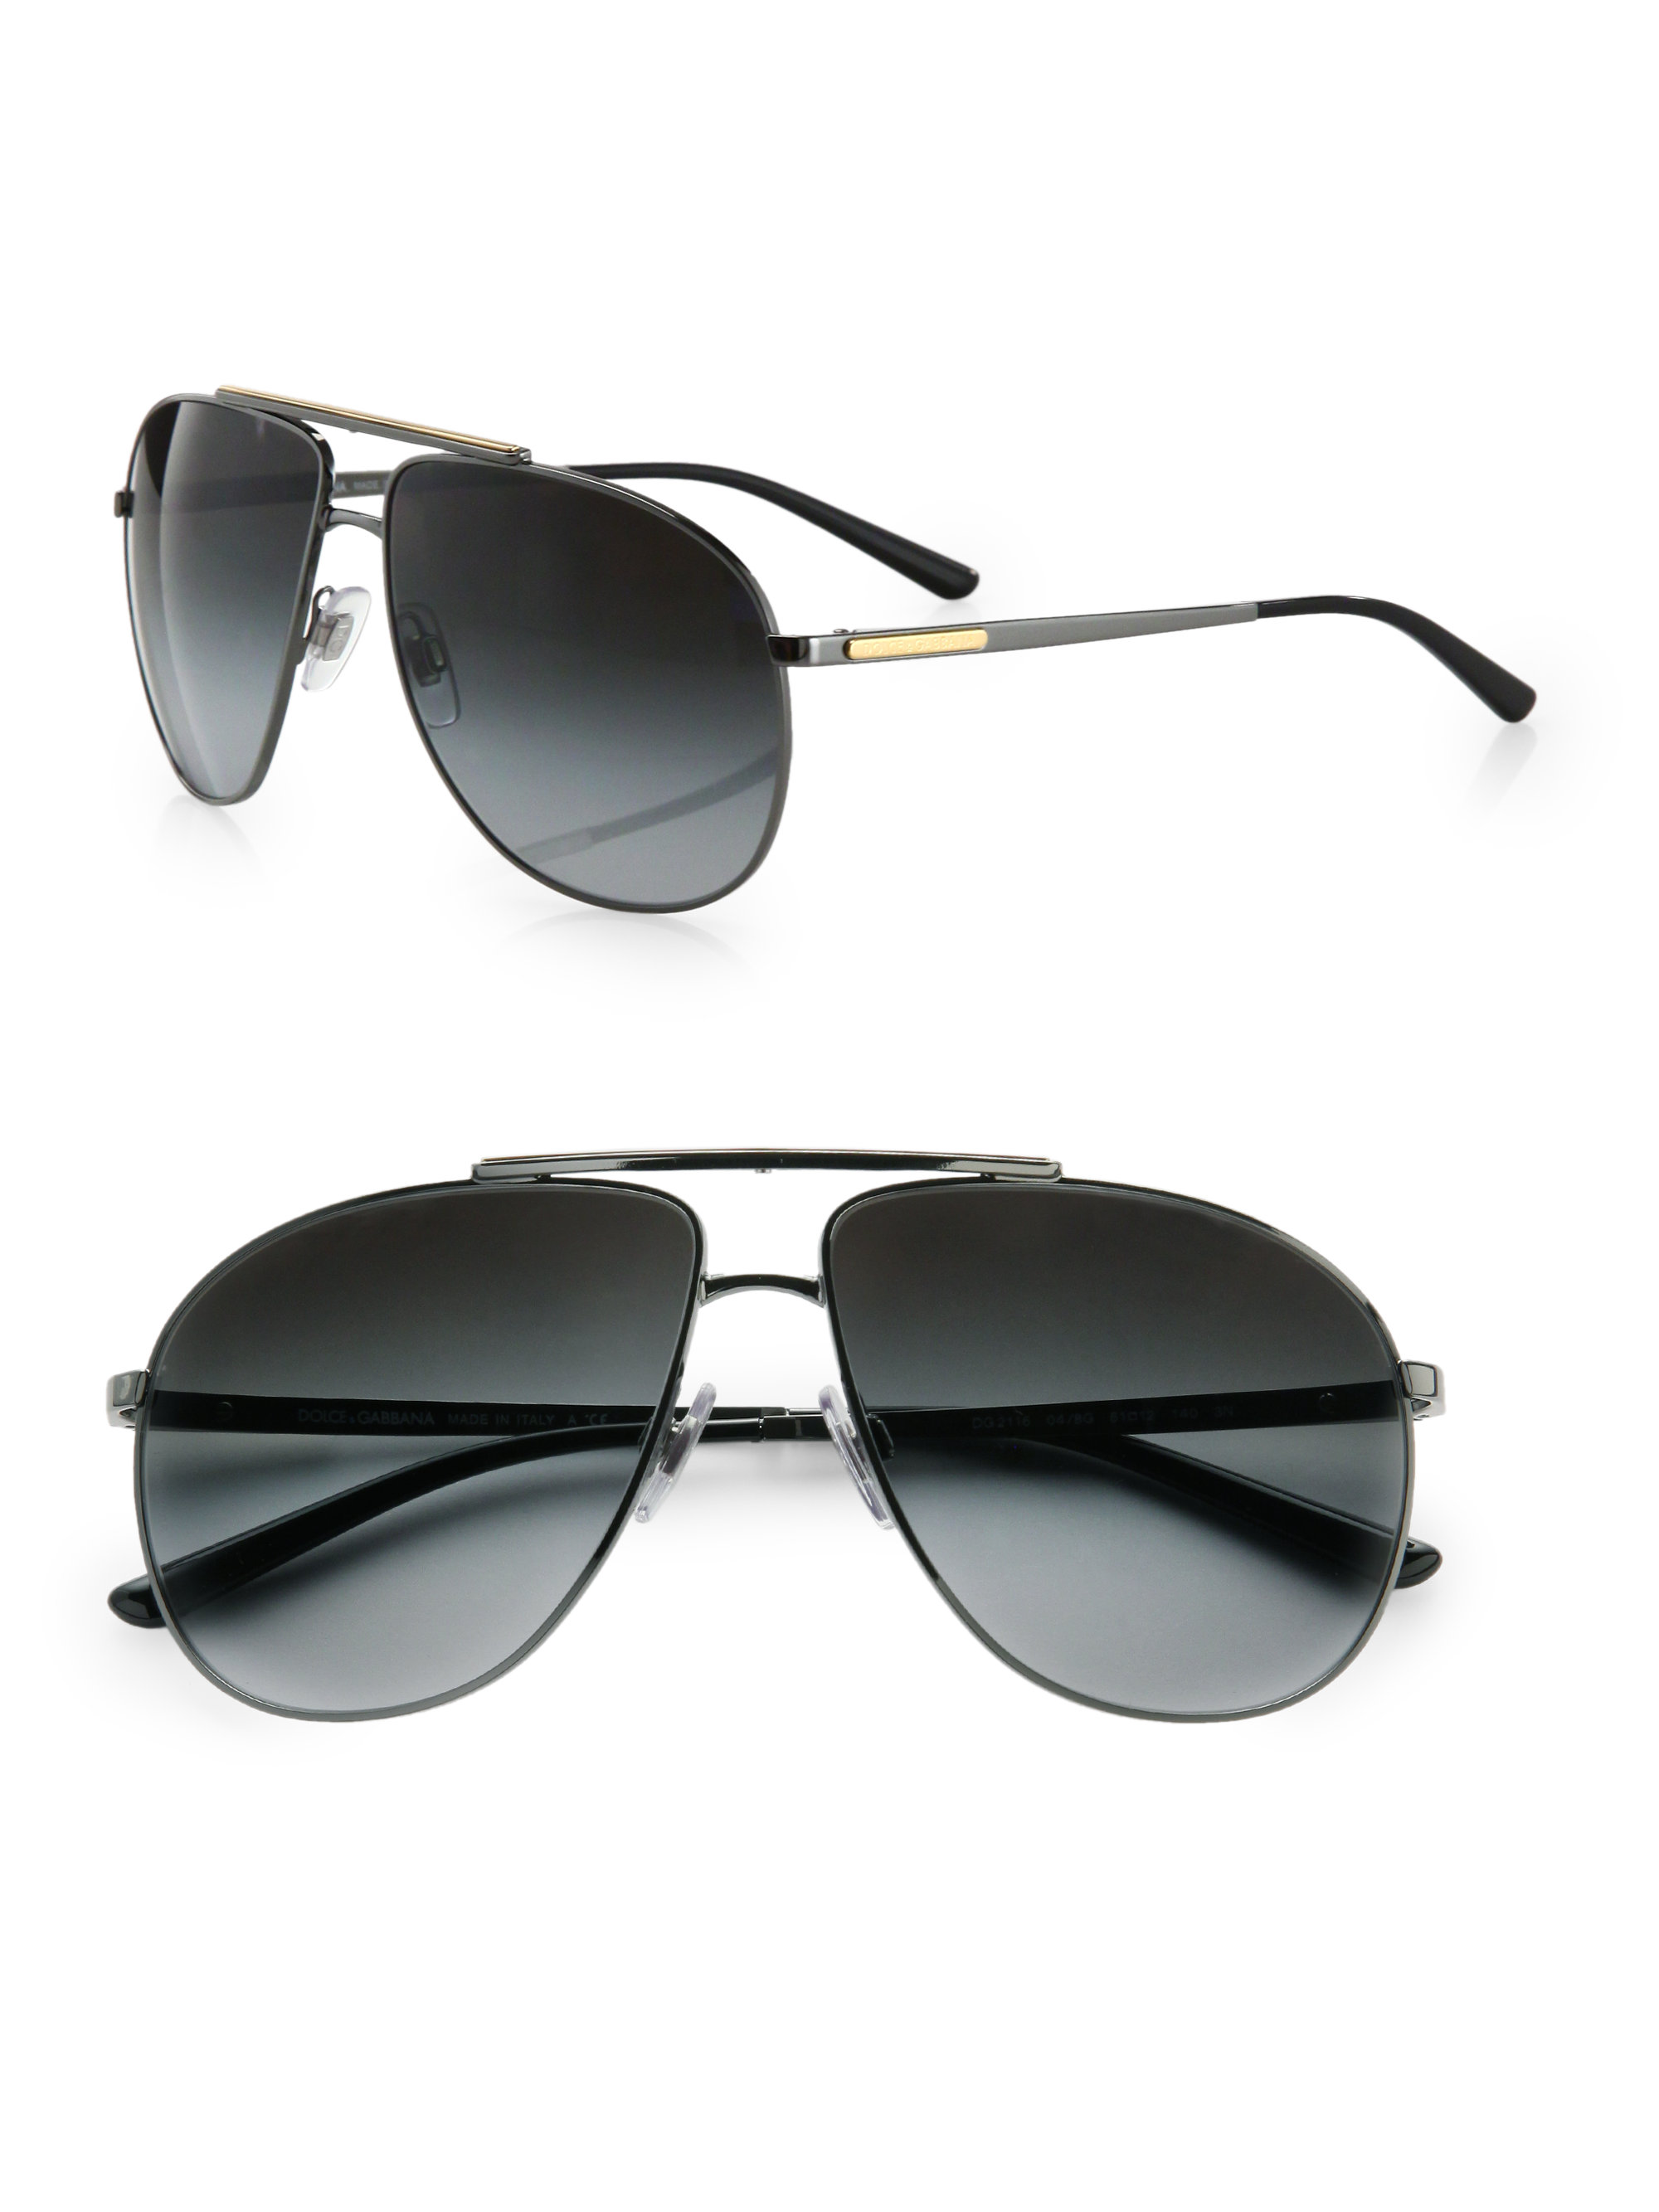 b22acc48492 Lyst - Dolce   Gabbana Metal Aviator Sunglasses in Black for Men